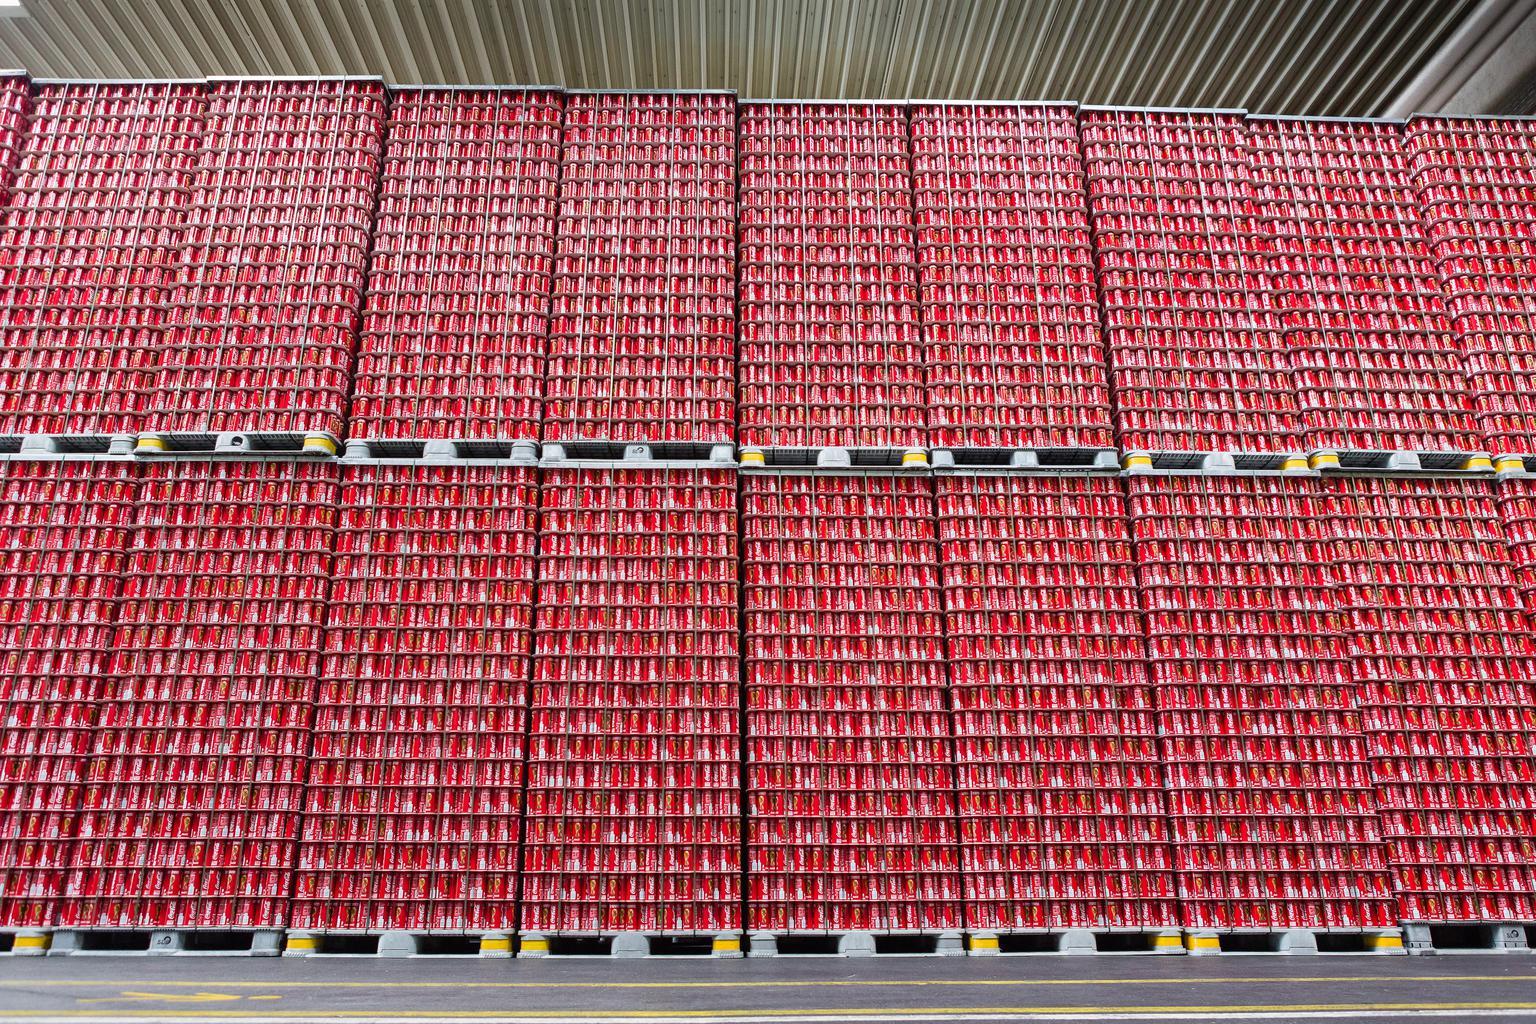 [Lokal Holland] 24 Dosen Coca Cola oder Coca Cola Zero (à 0,29 cent) (PFANDFREI)